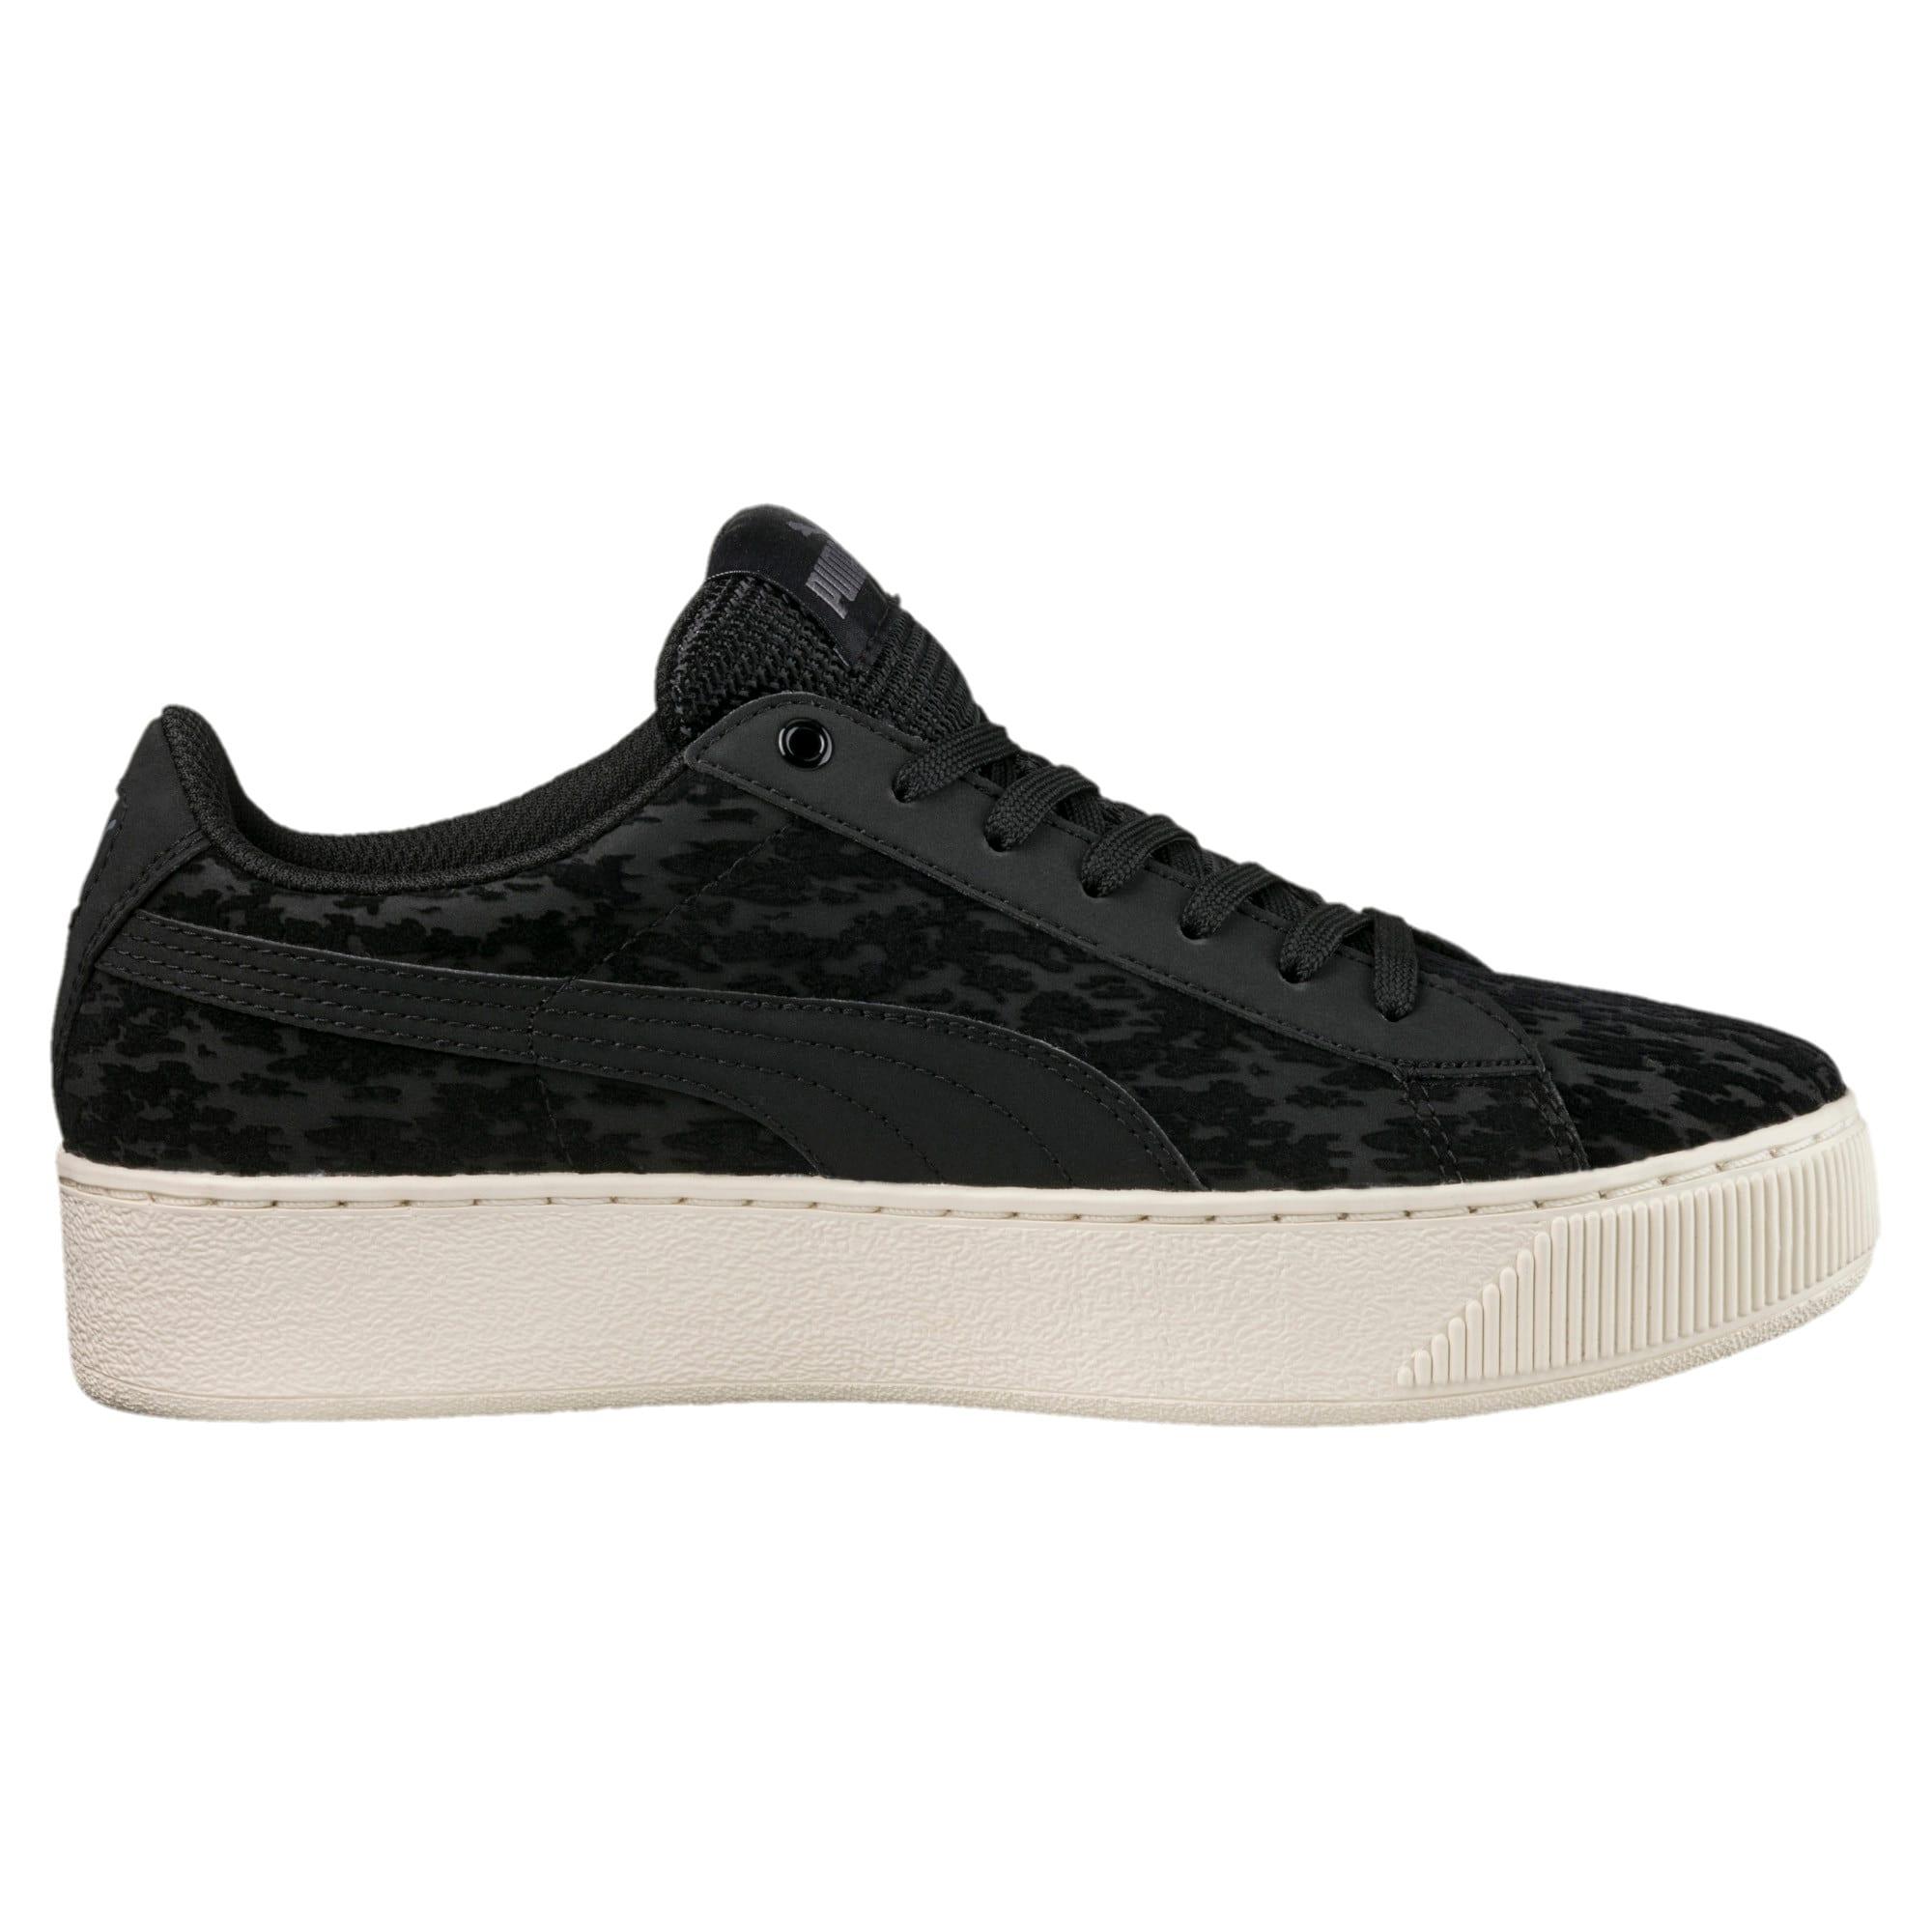 Thumbnail 3 of Vikky Platform Velvet Rope Women's Sneakers, Puma Black-Puma Black, medium